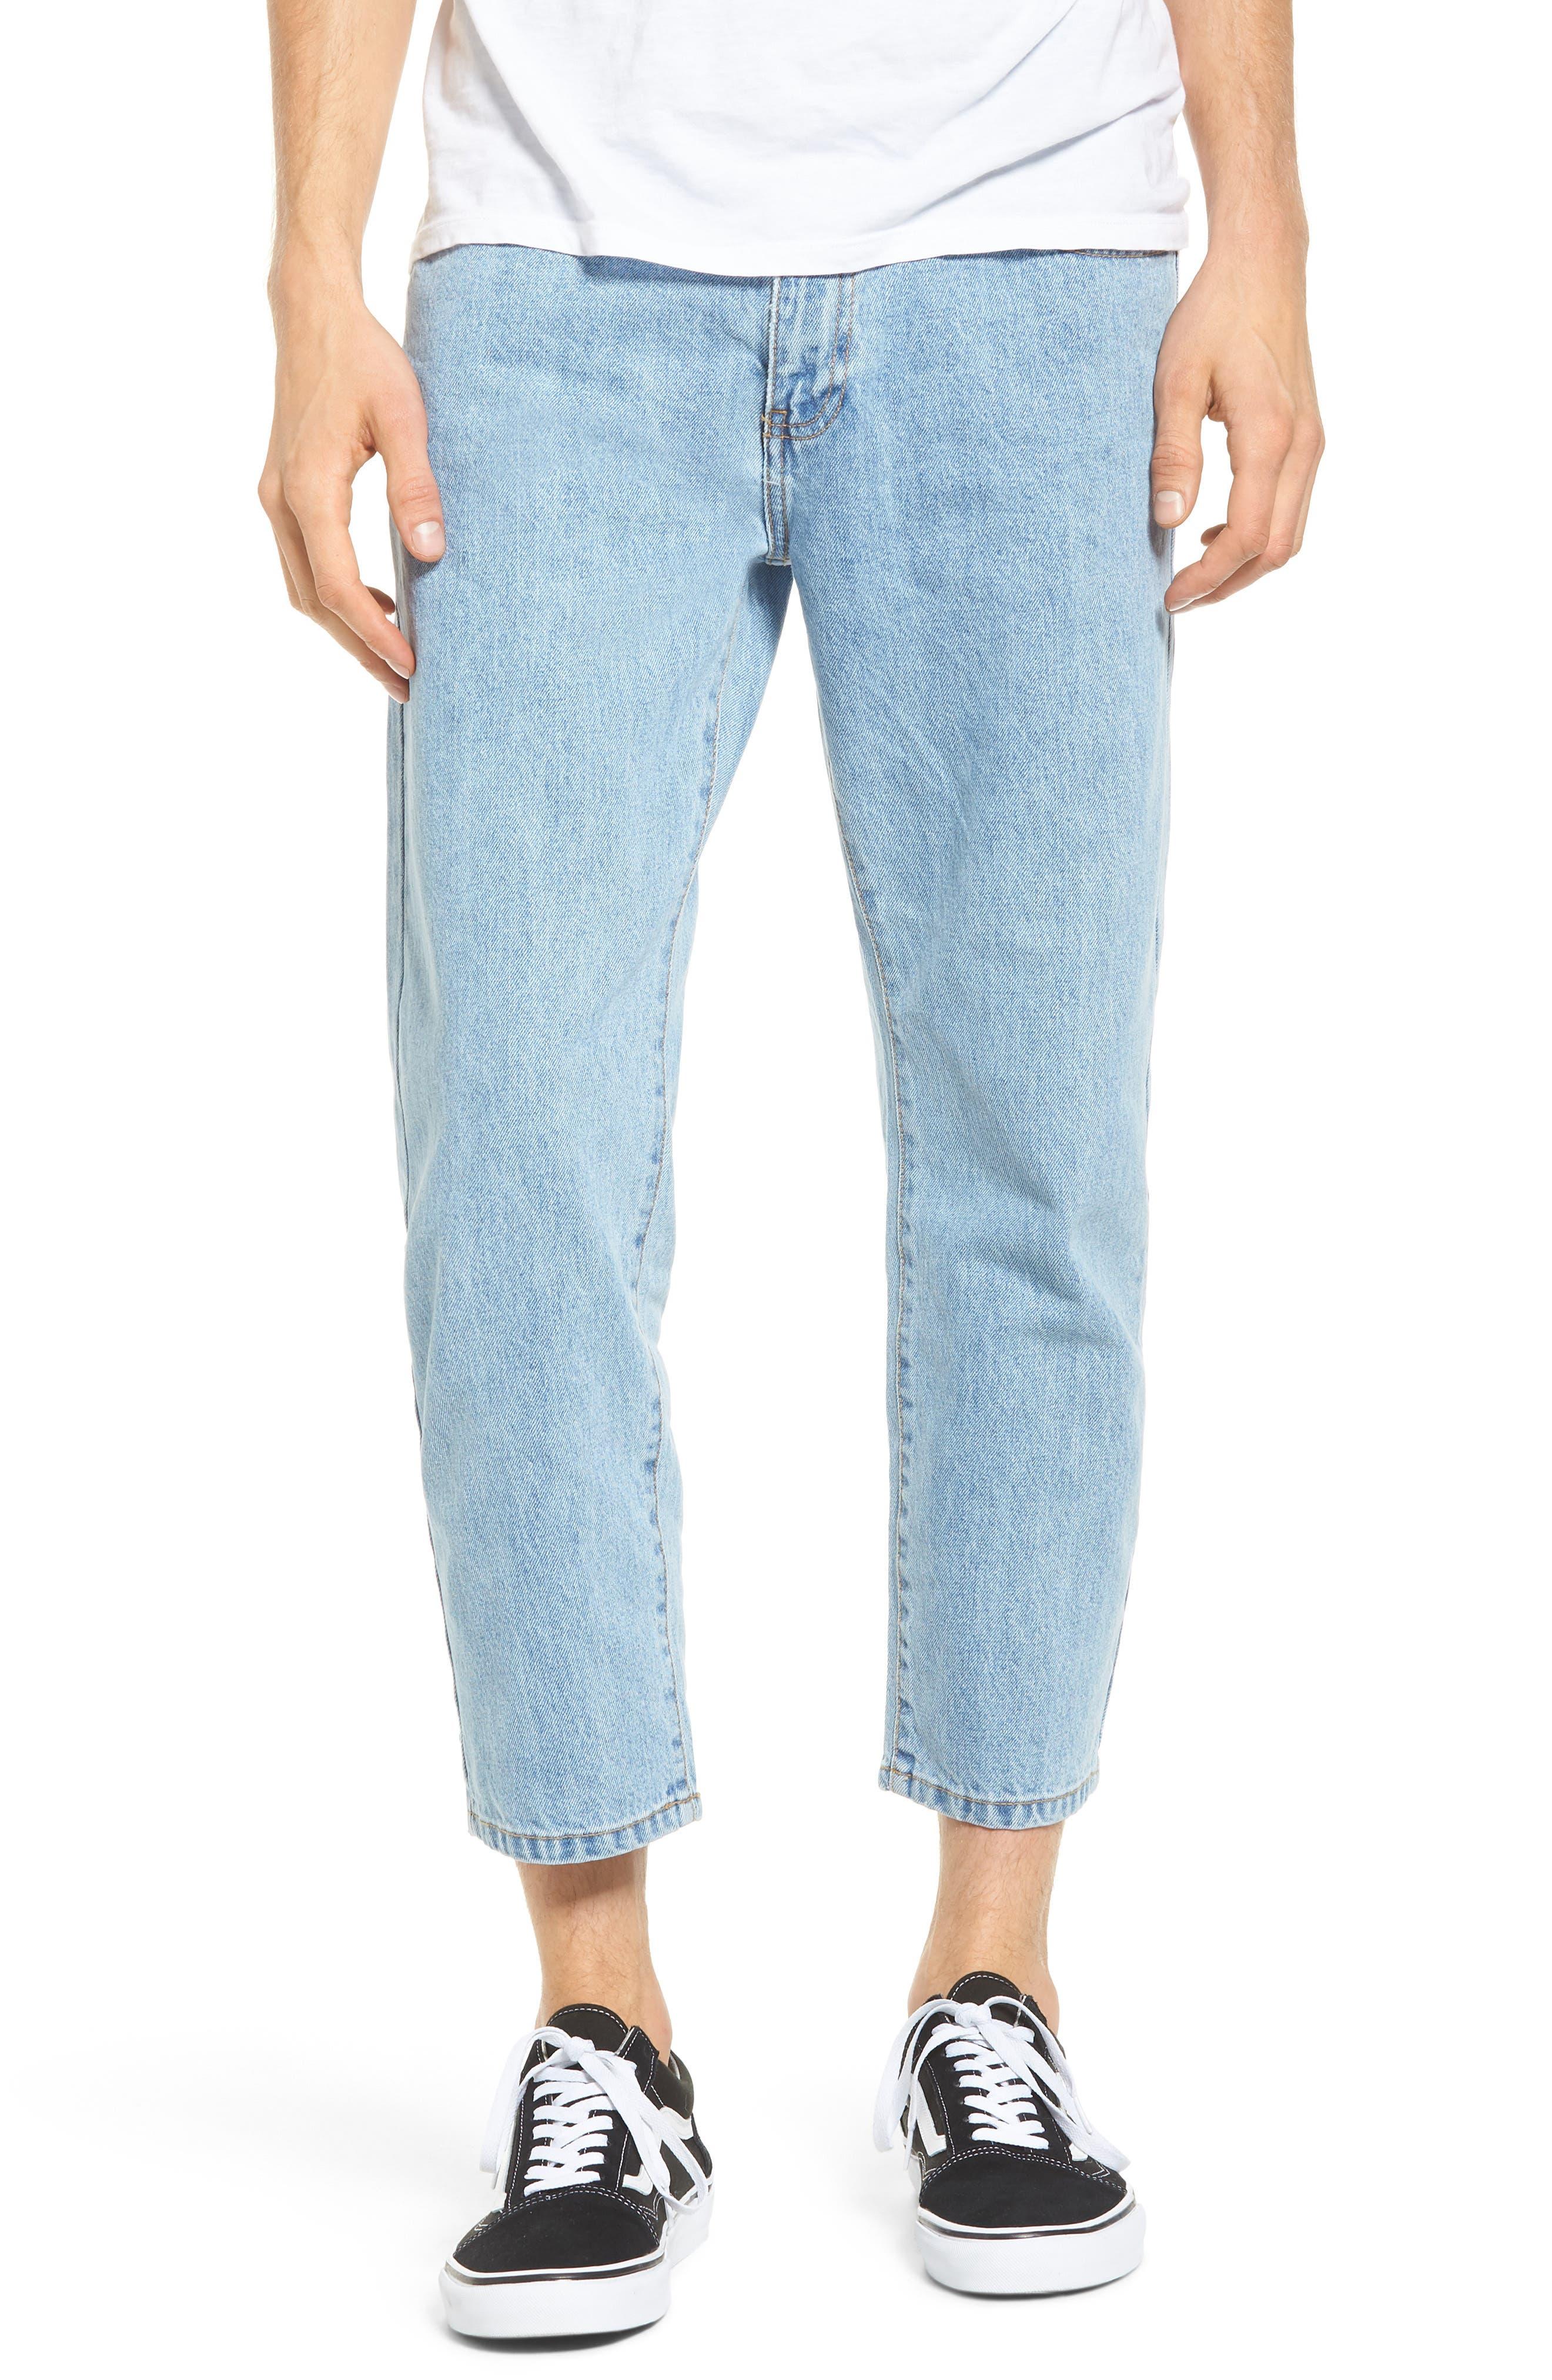 Main Image - Dr. Denim Supply Co. Otis Straight Fit Jeans (Light Retro)